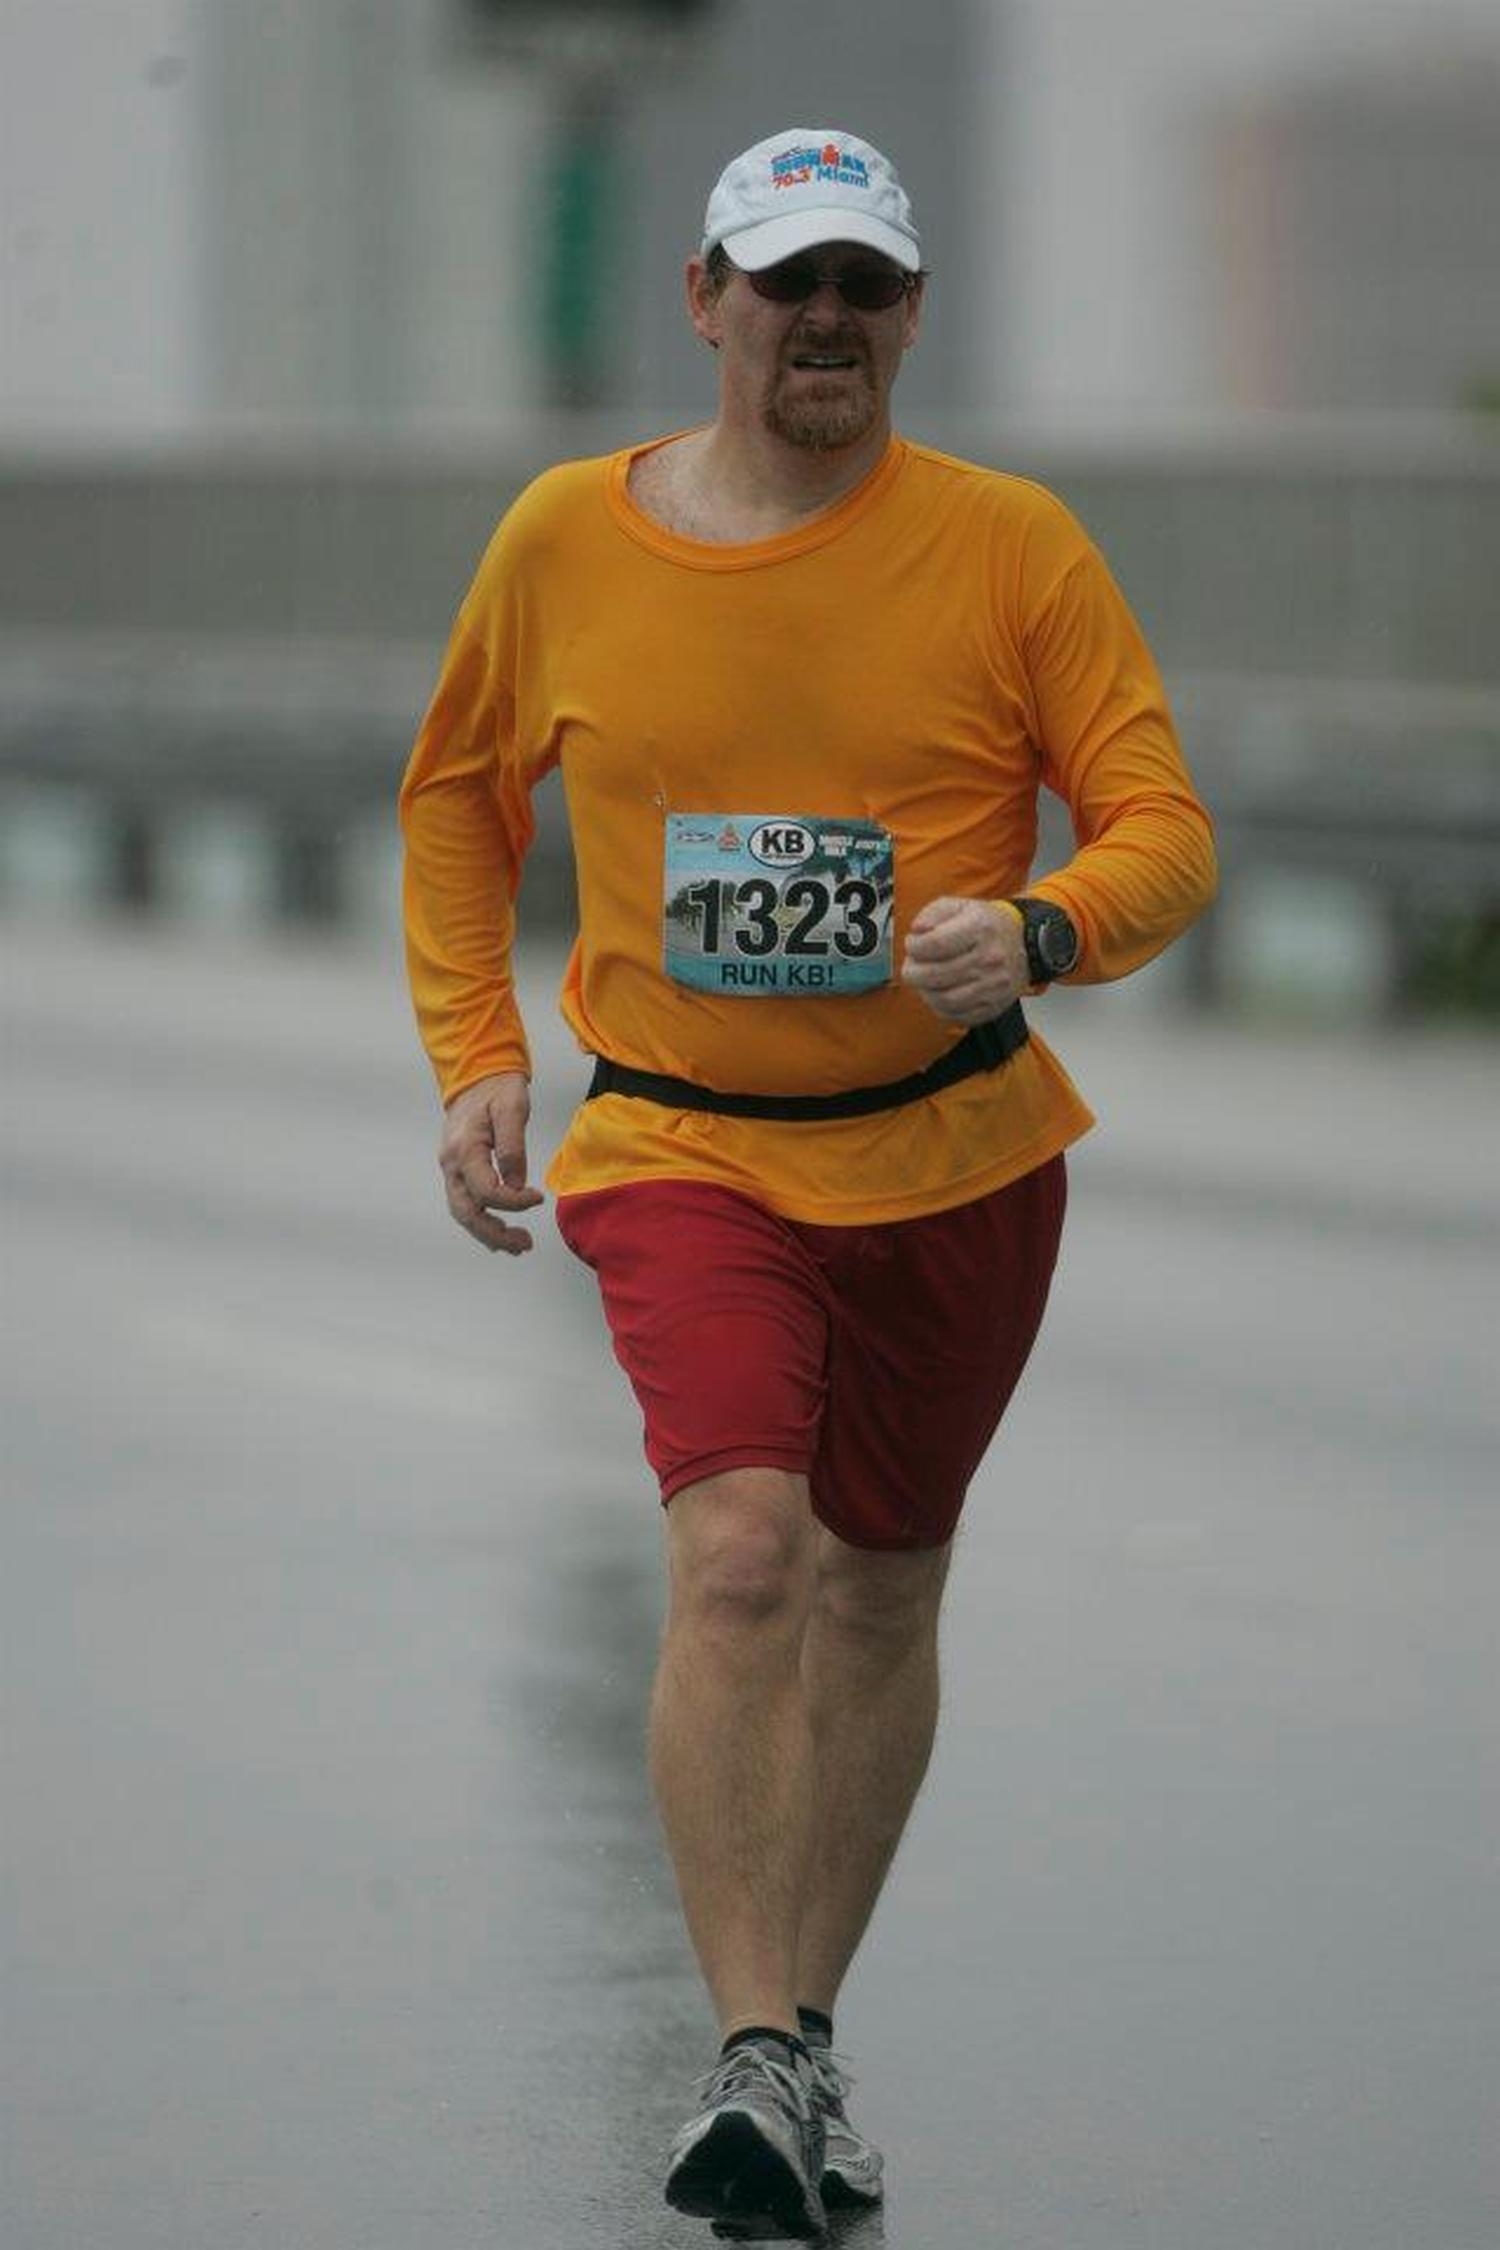 1st racewalking competition, Key Biscayne Half 2012